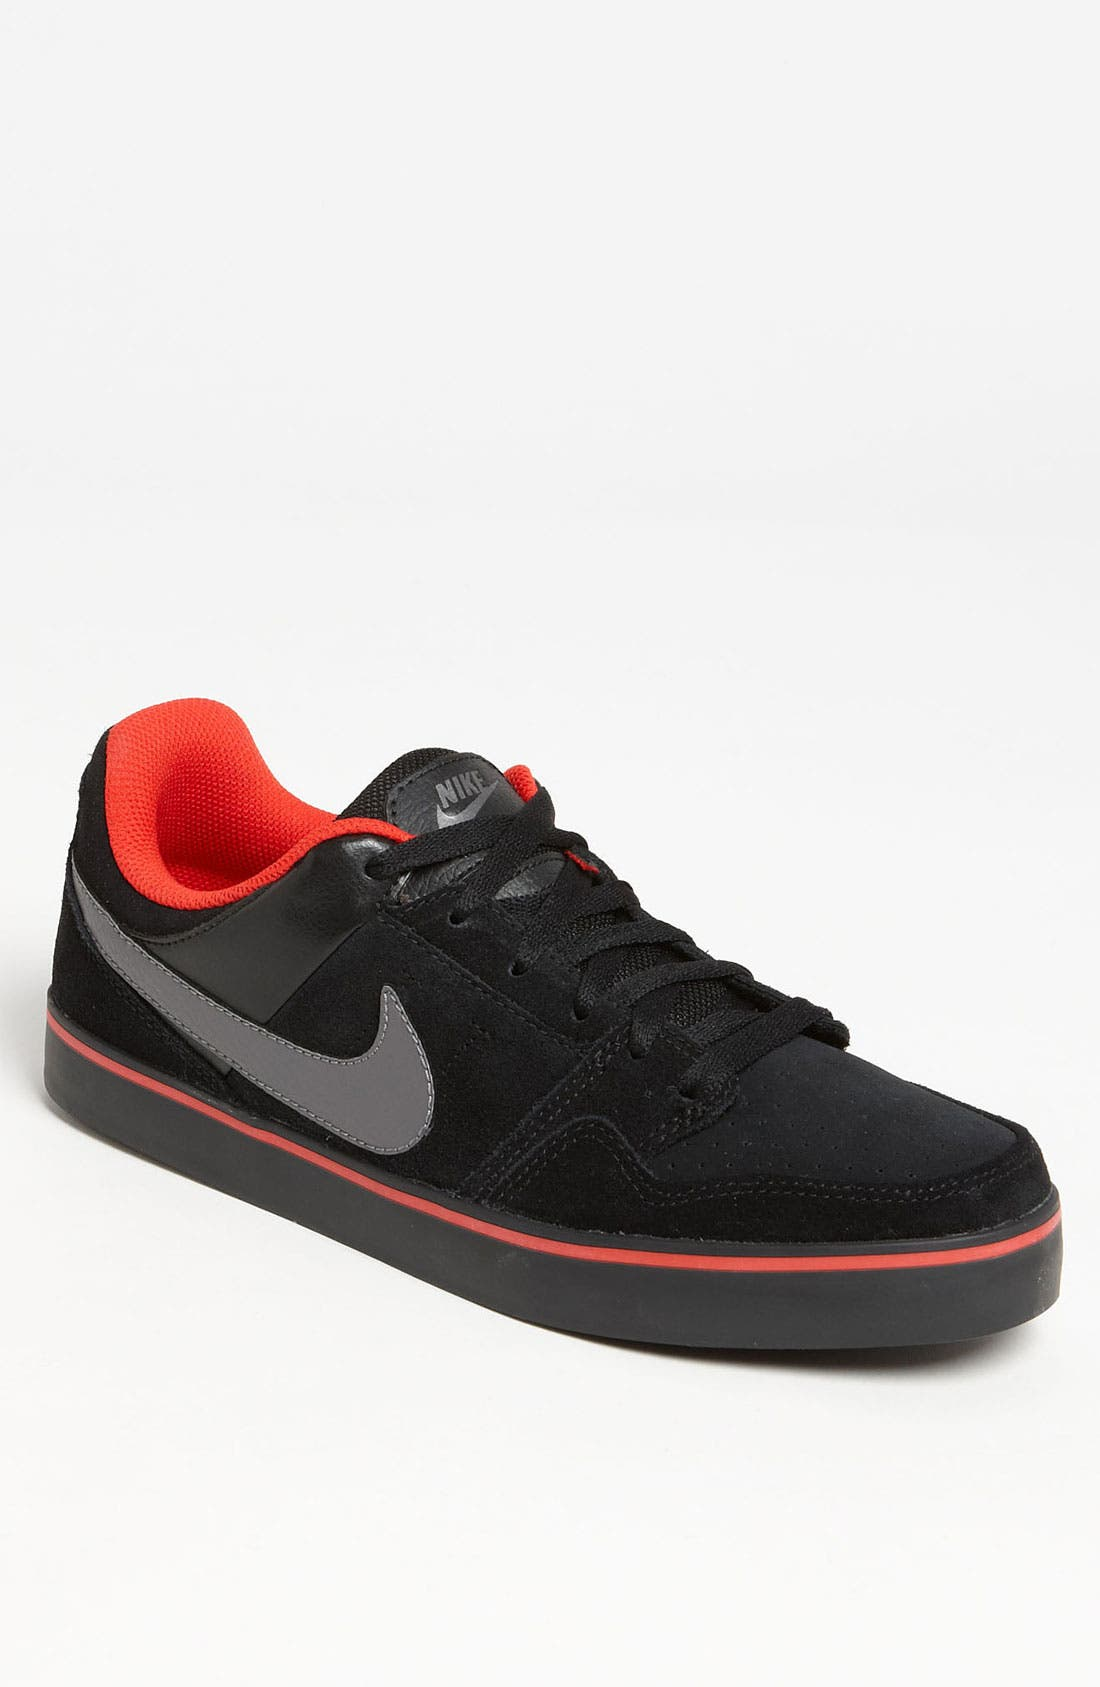 Main Image - Nike 'Mogan 2 SE' Sneaker (Men) (Online Only)